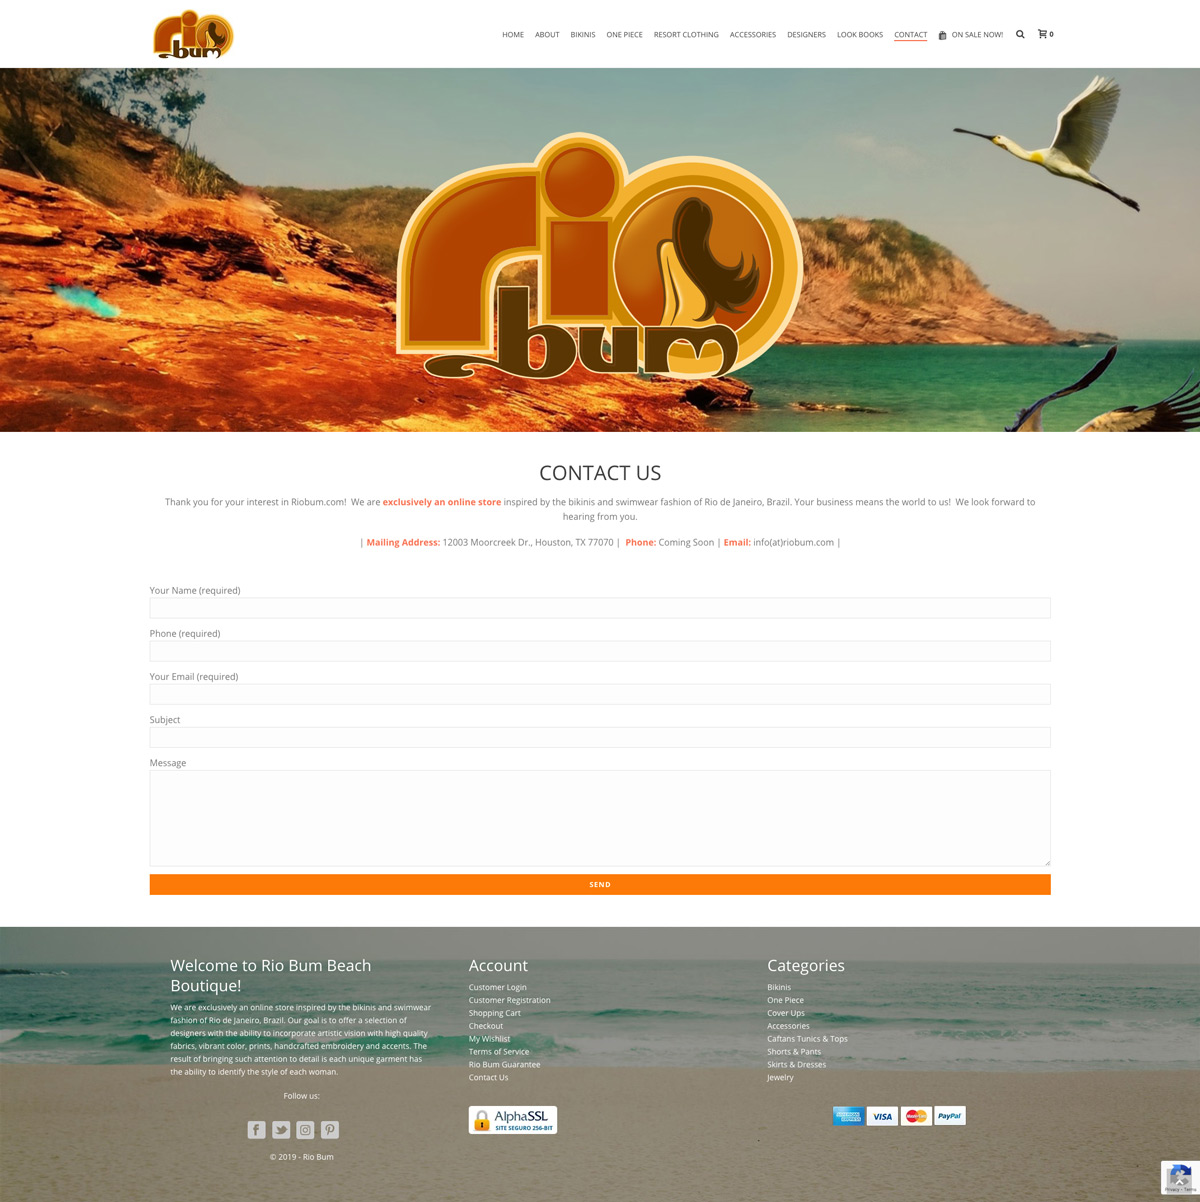 ecommerce-website-design-cypress-the-woodlands-5